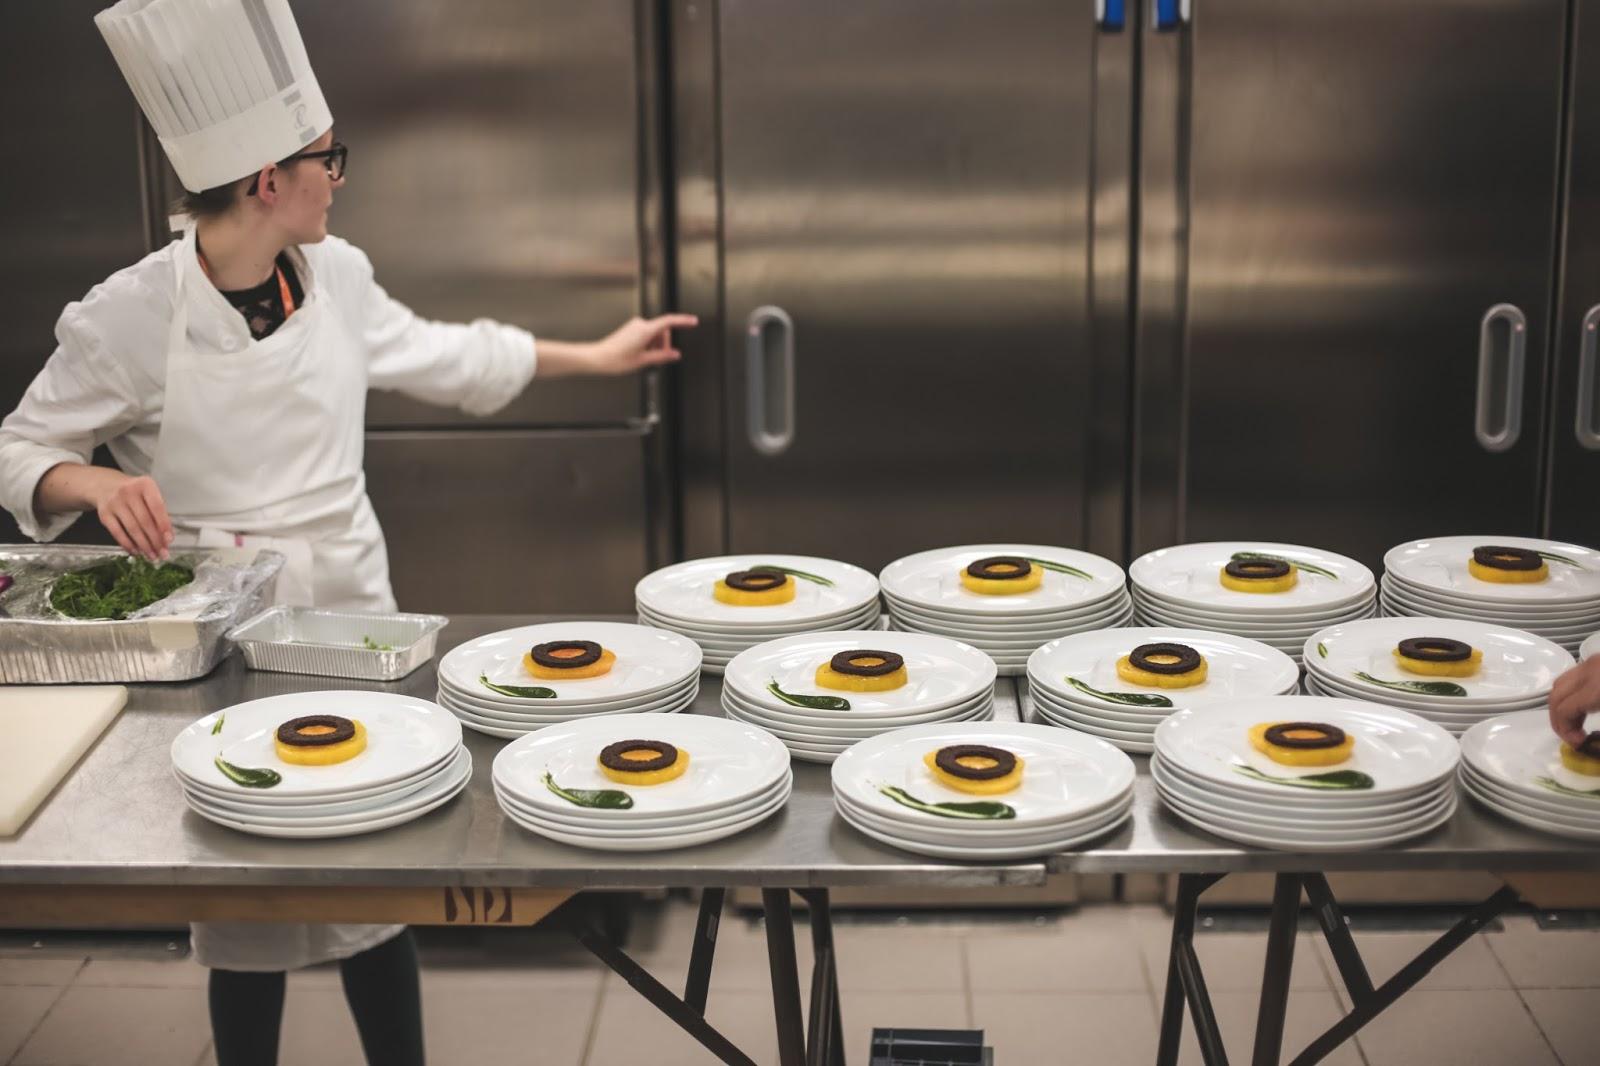 coulisse cuisine roland garros 2017